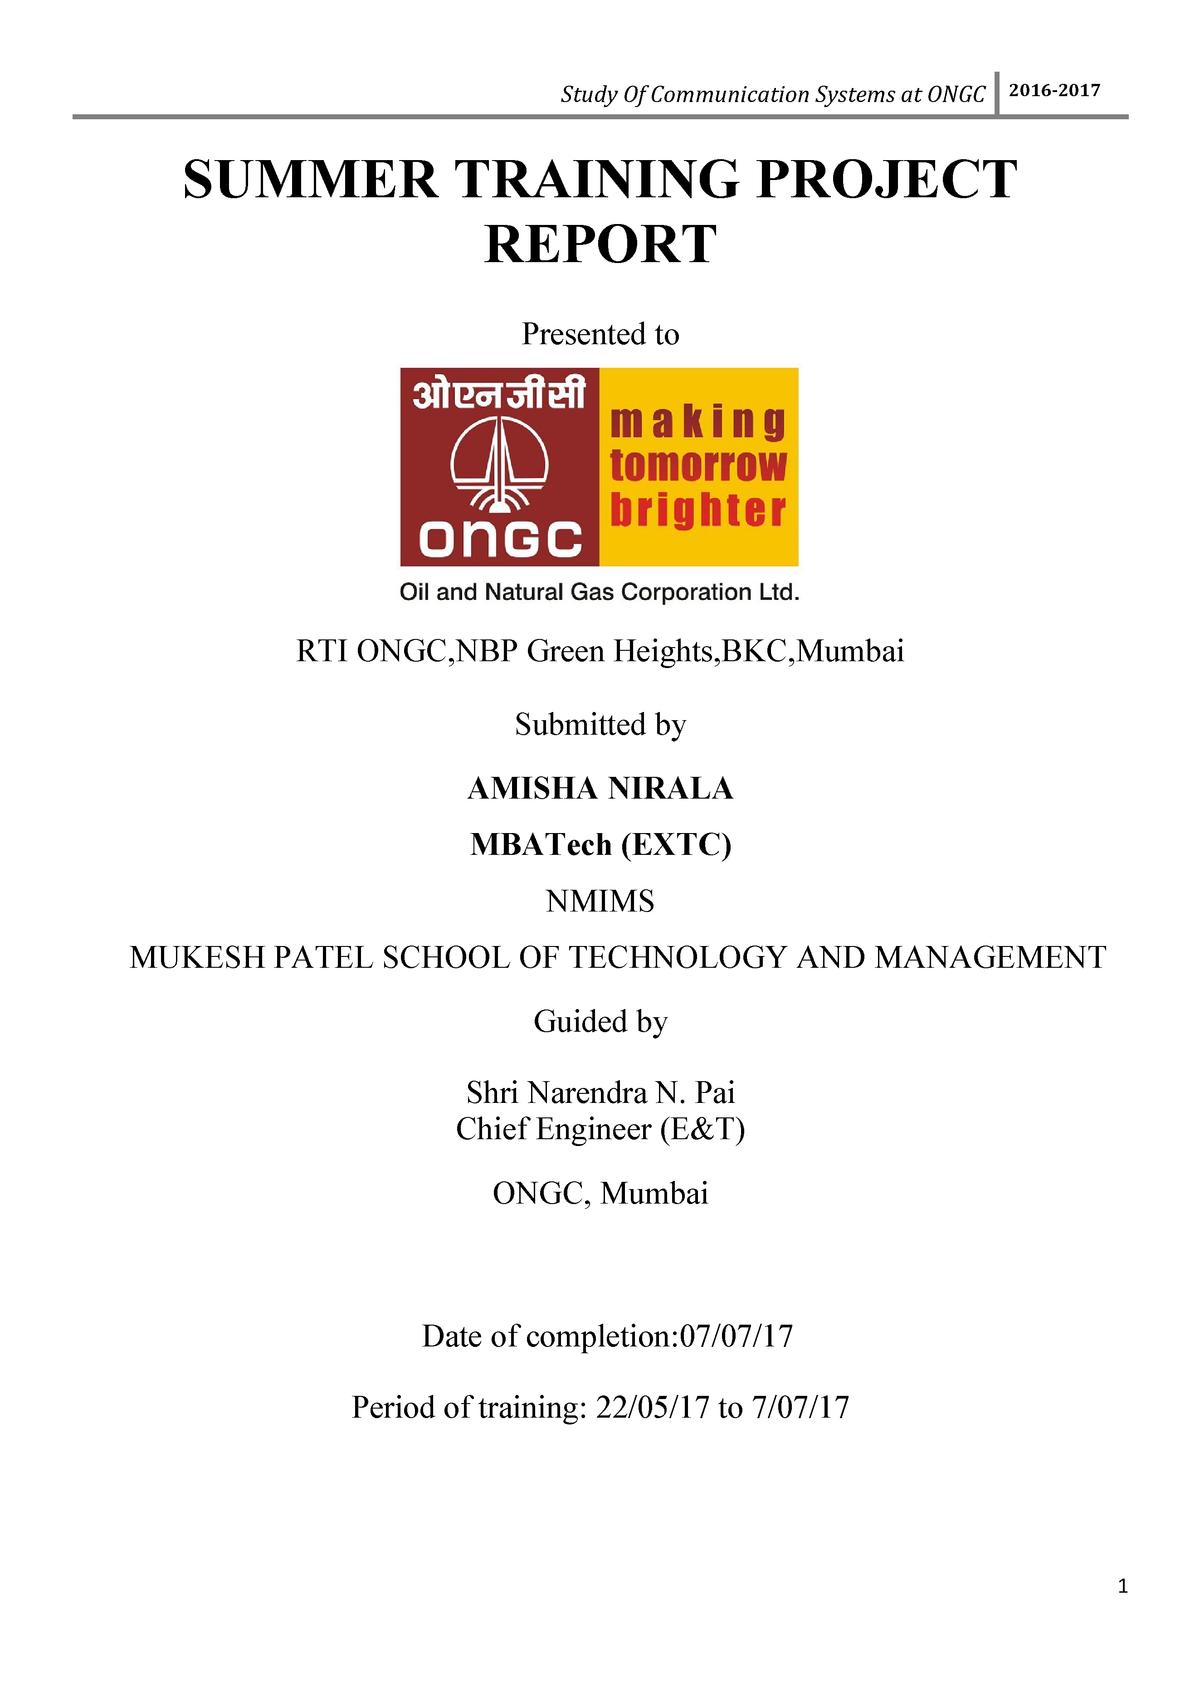 ONGC Training Report Amisha - OECS 231: Data Cmnctns/Ntwrk Ii - StuDocu